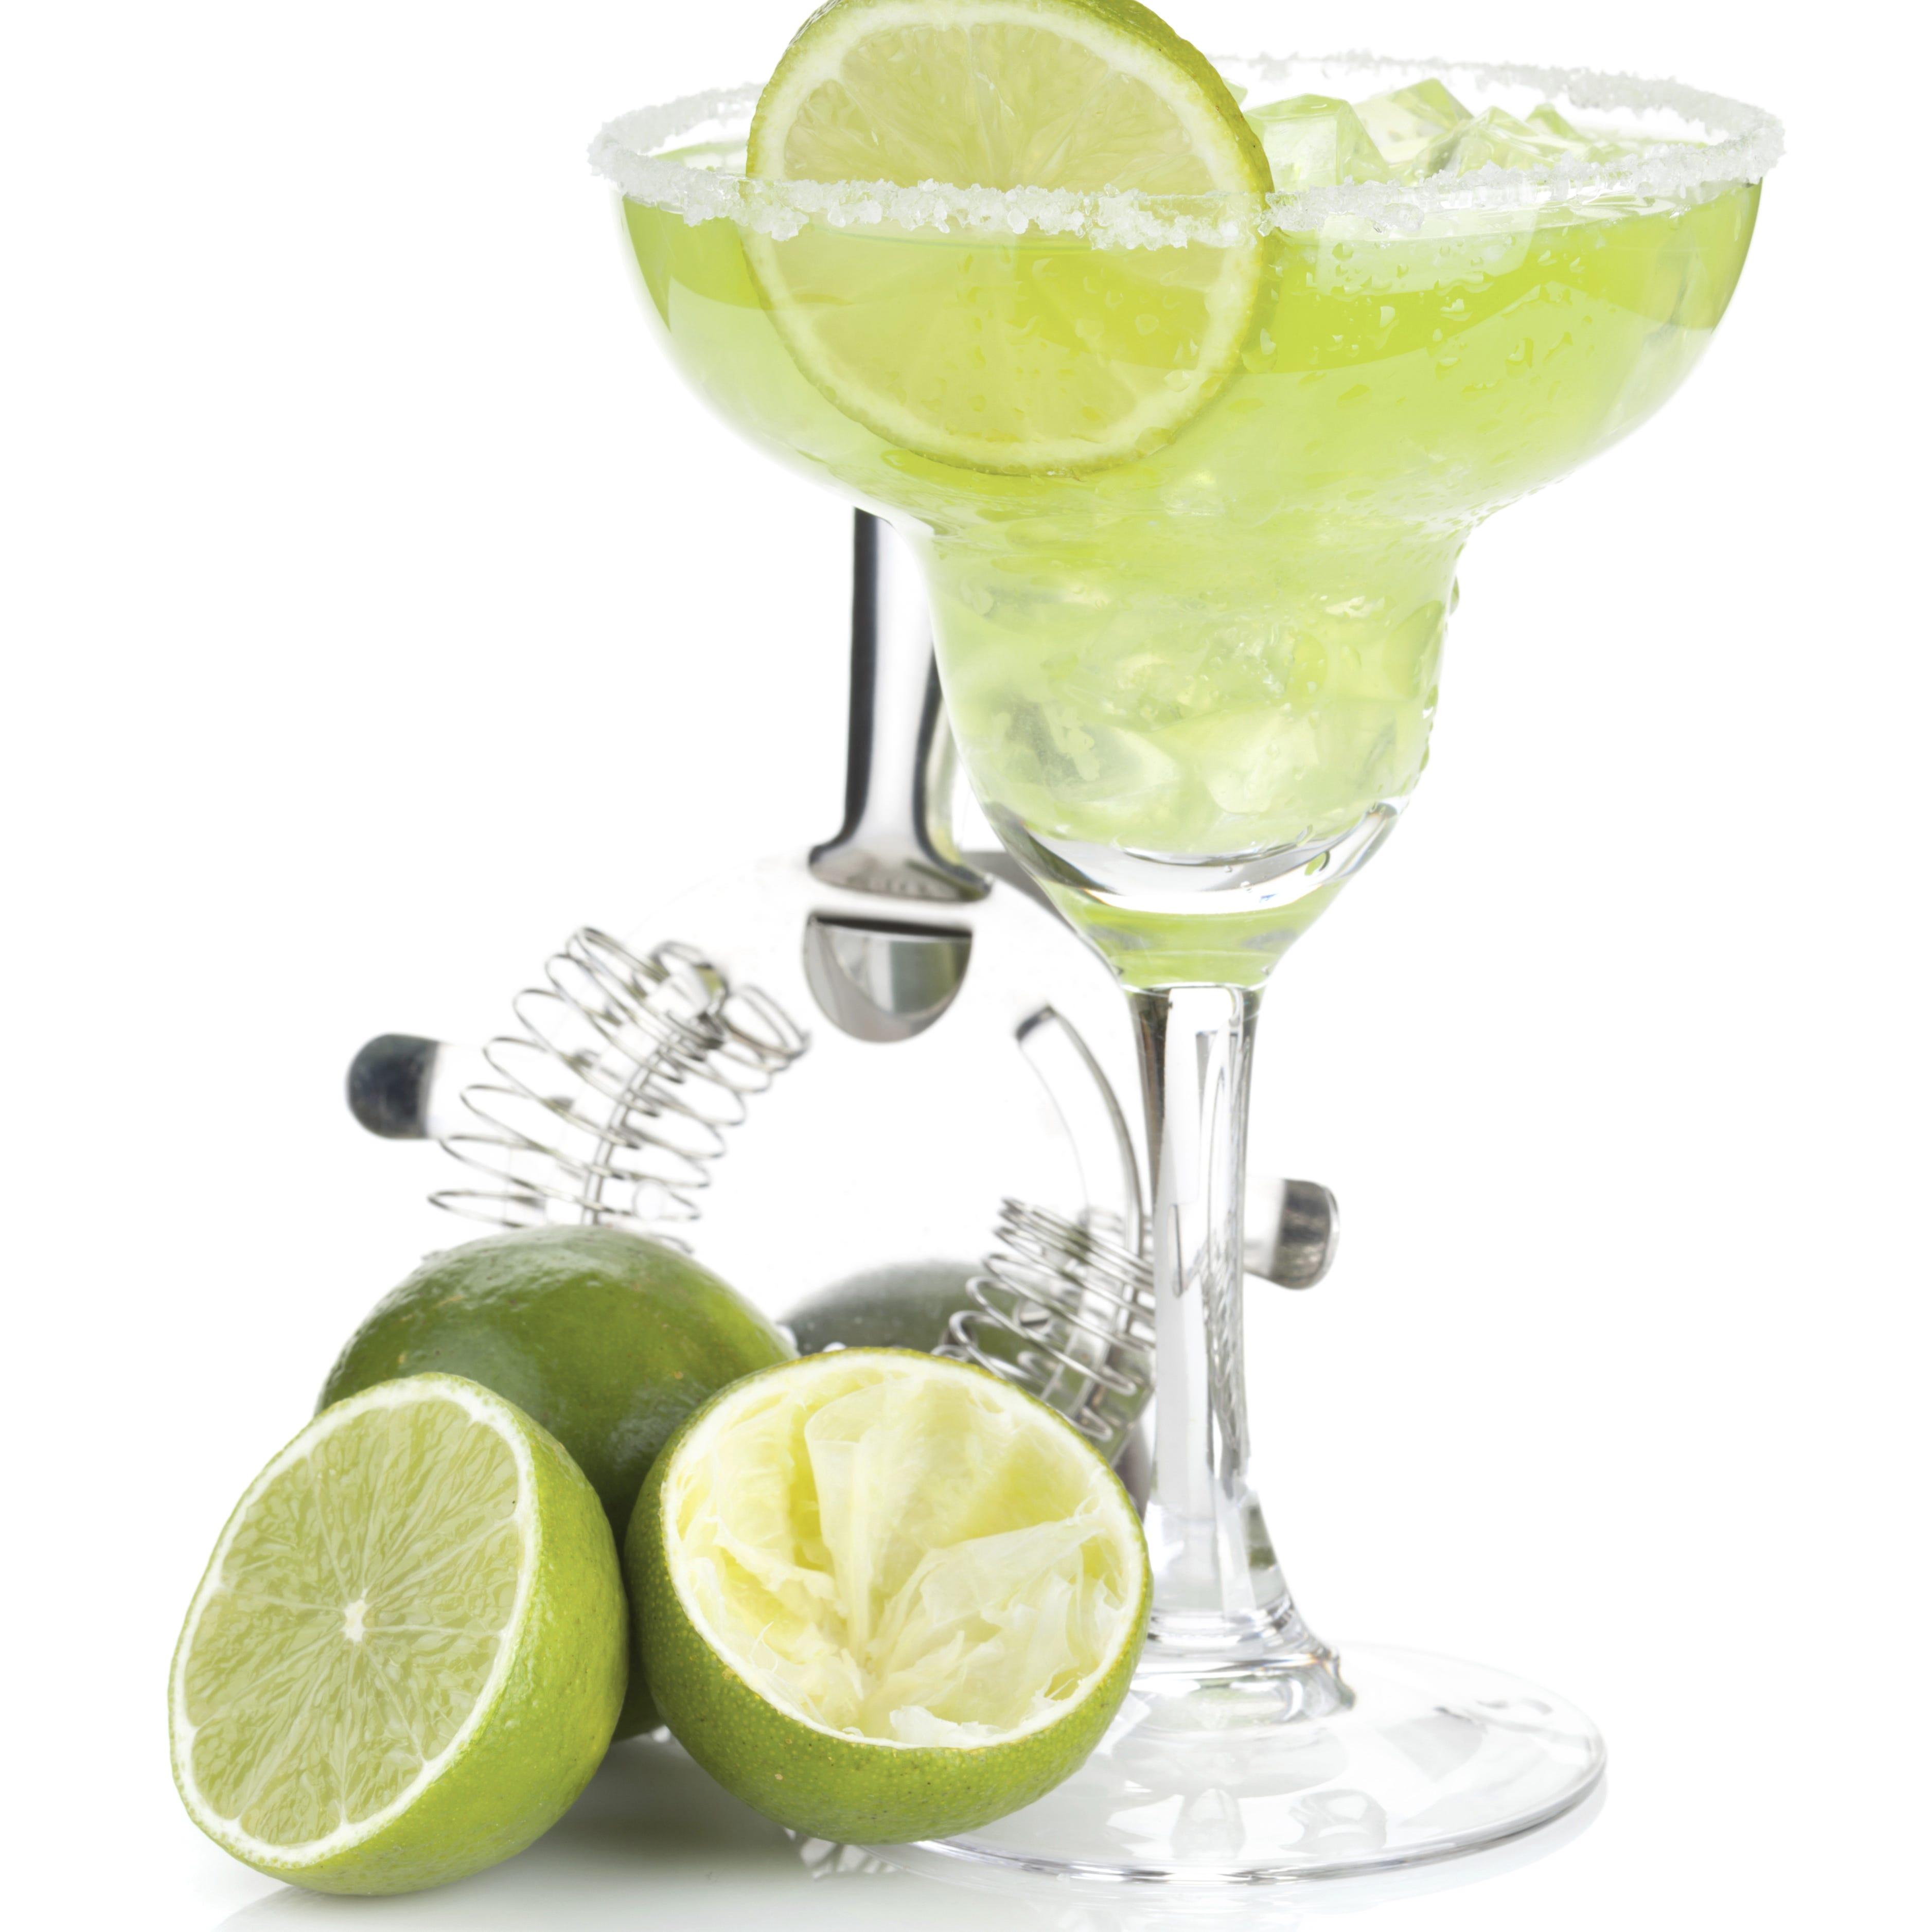 321 Flavor: Margarita tops the list of Brevard's favorite cocktails